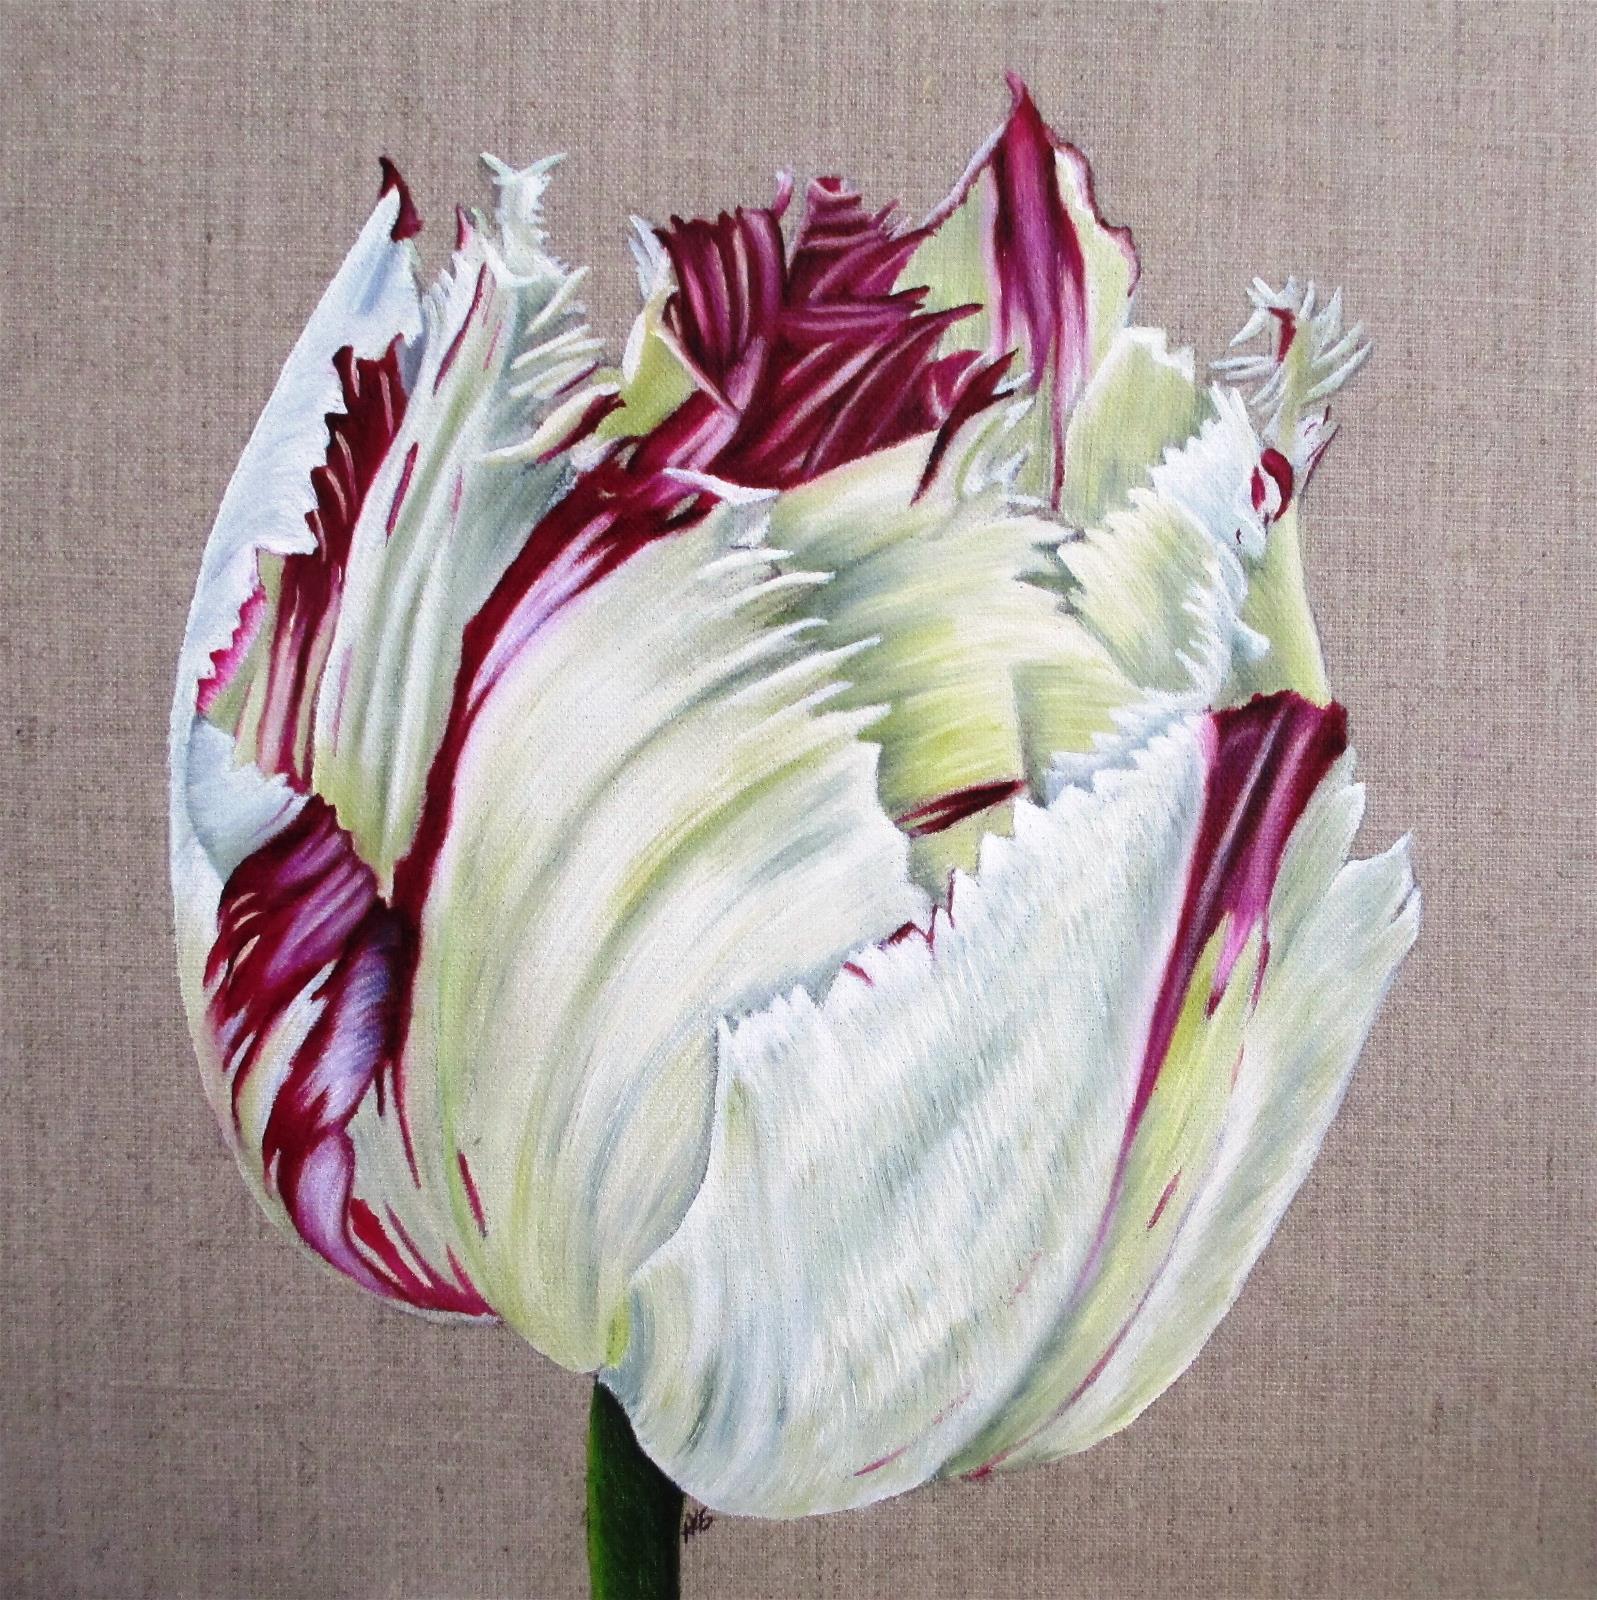 Flame Tulip 2